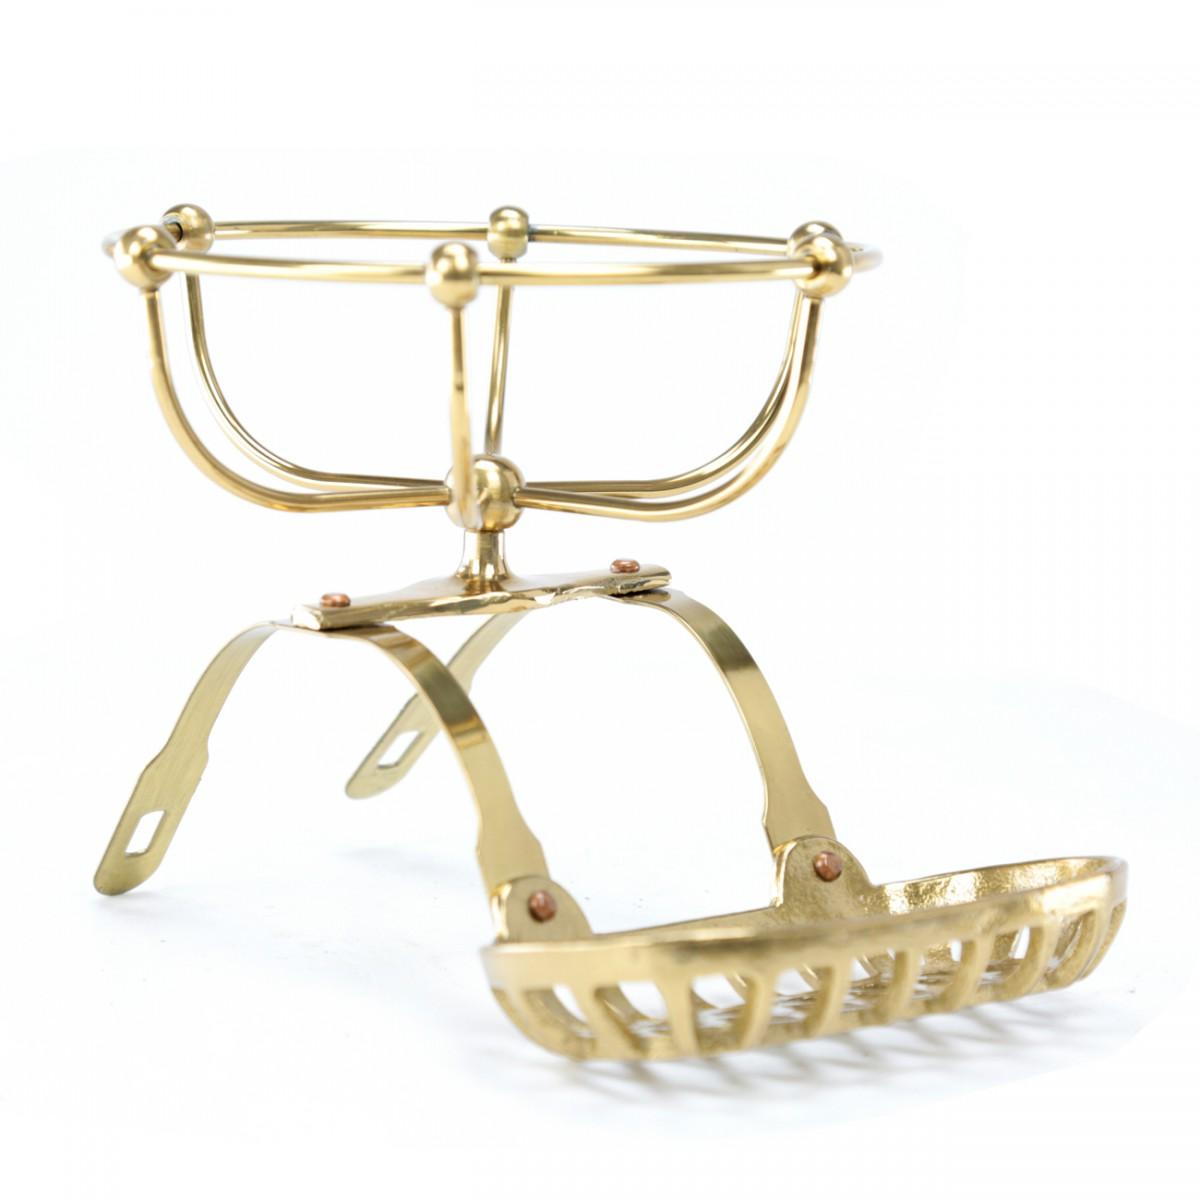 Clawfoot Tub Soap Dish Sponge Holder Brass - Accessories for clawfoot tub